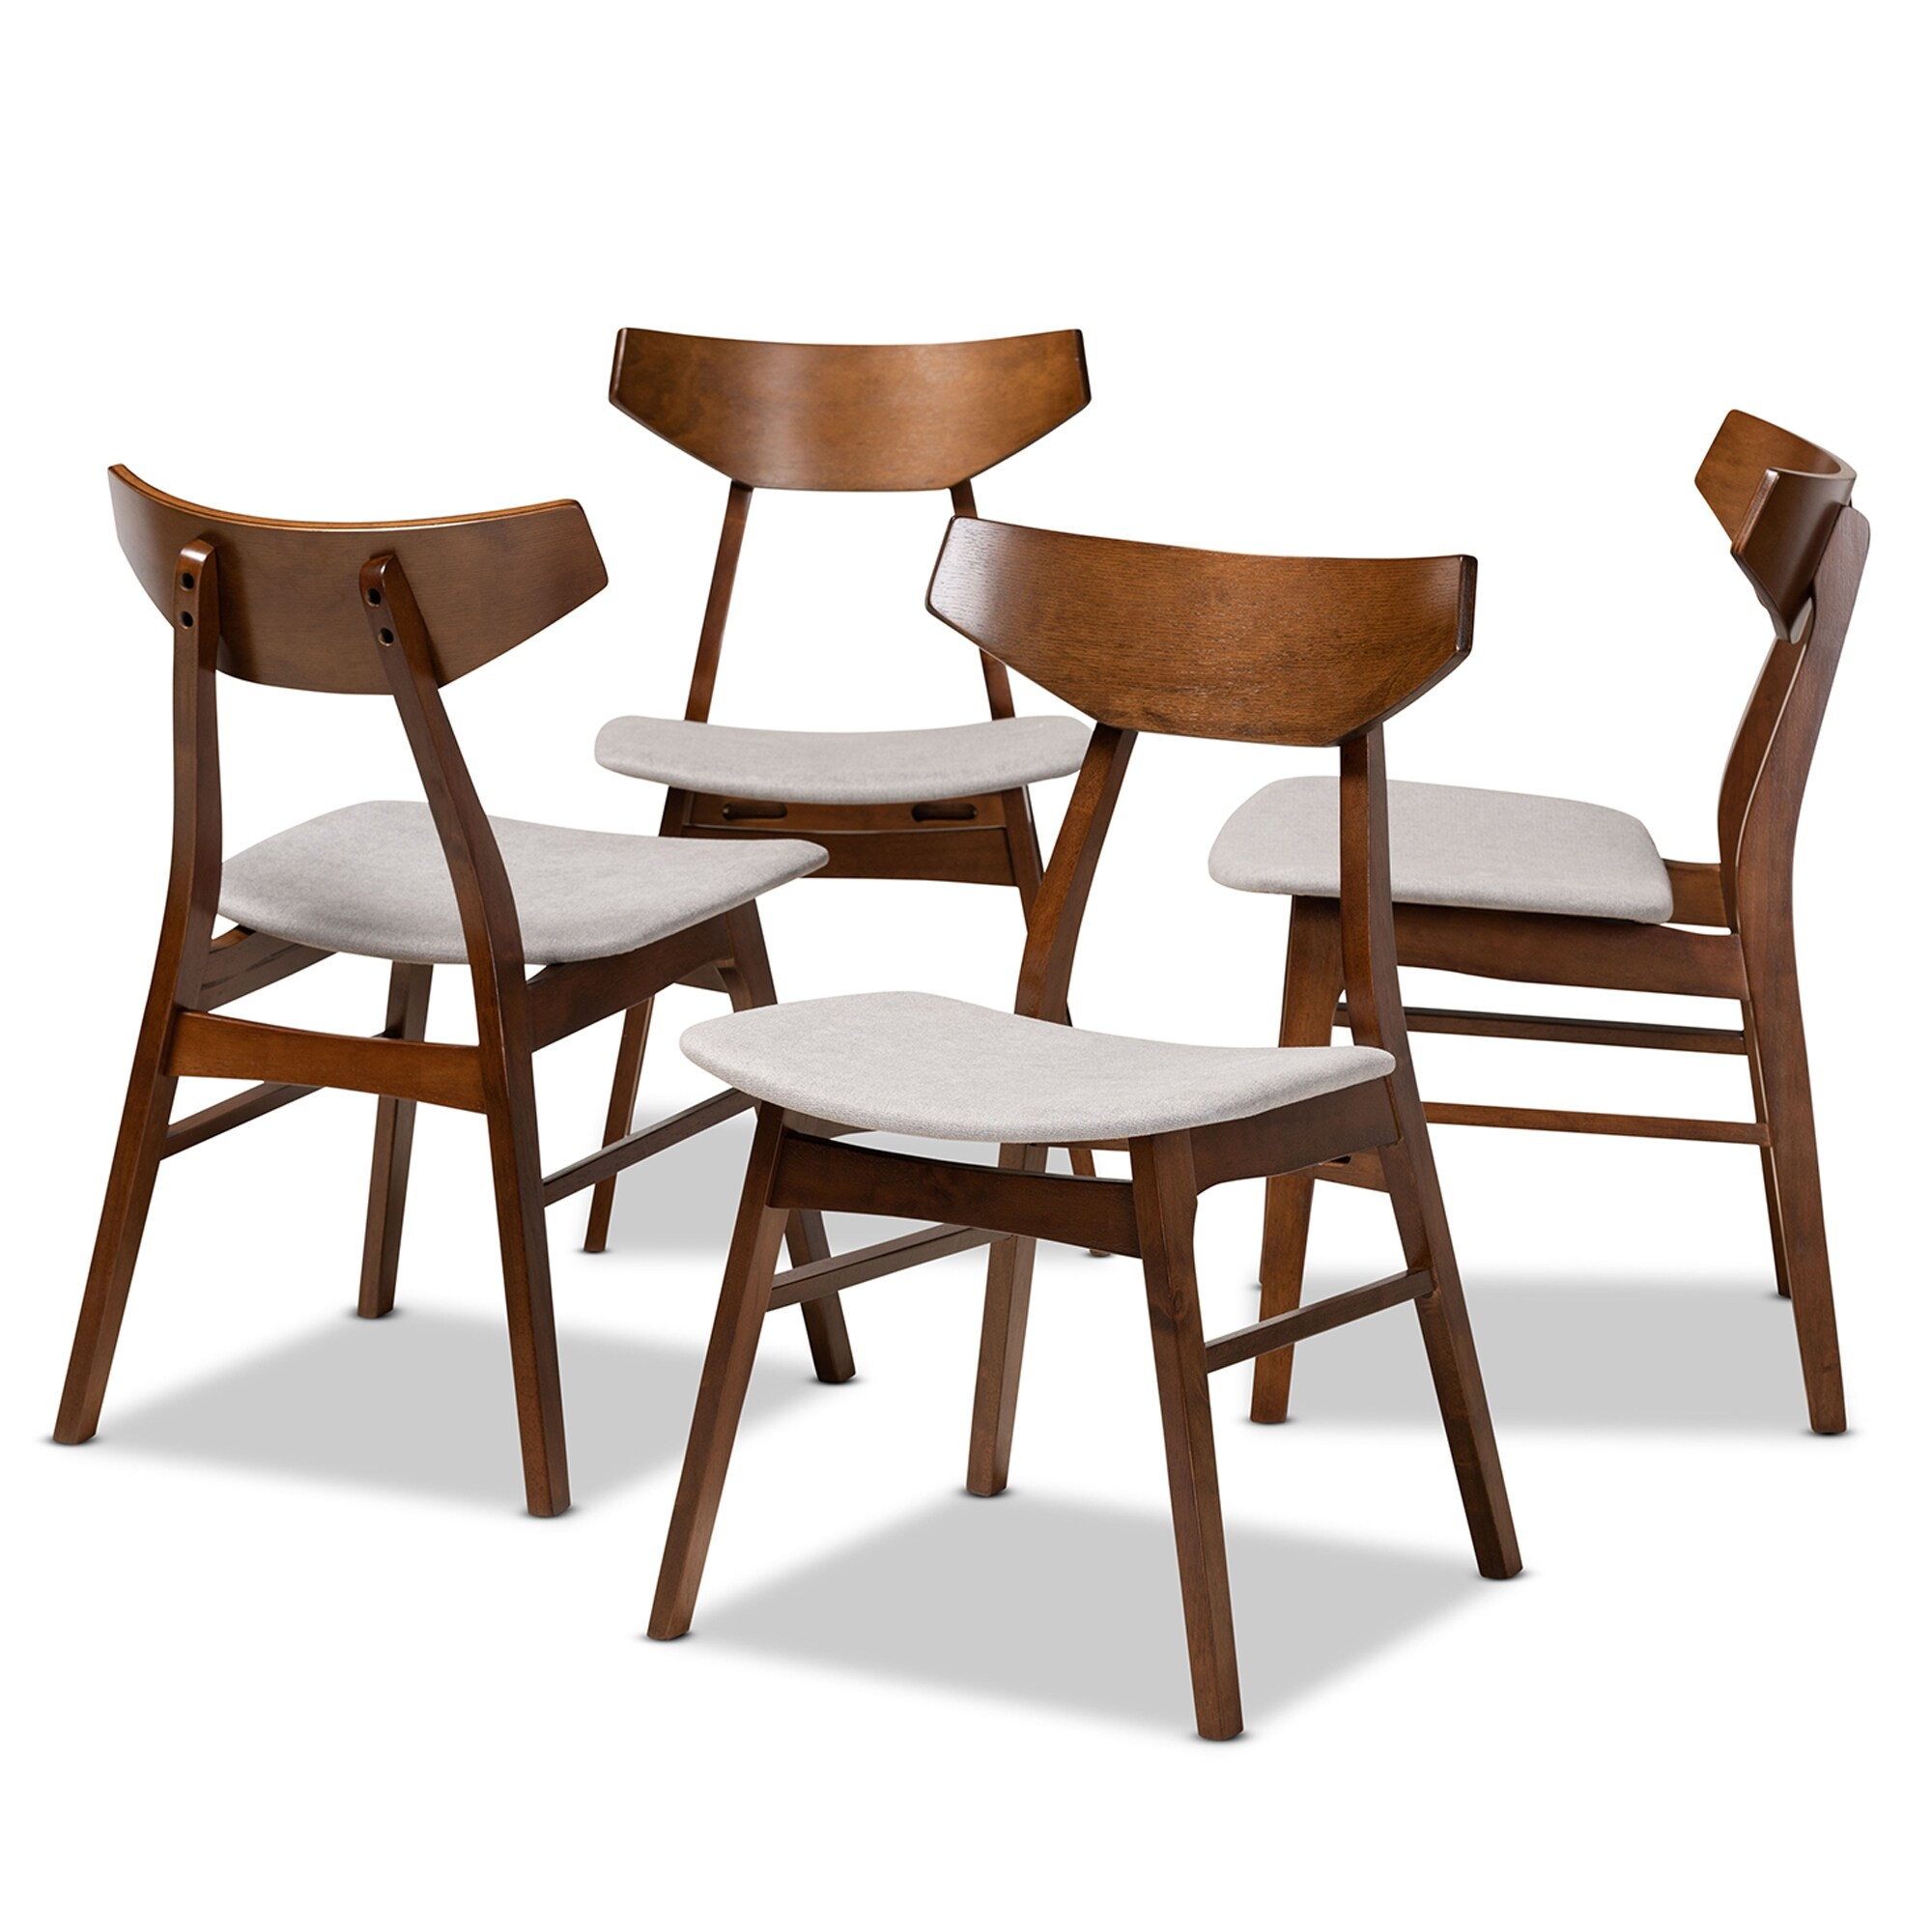 Danica Mid Century Modern Transitional 4 Piece Dining Chair Set Overstock 31227447 Light Grey